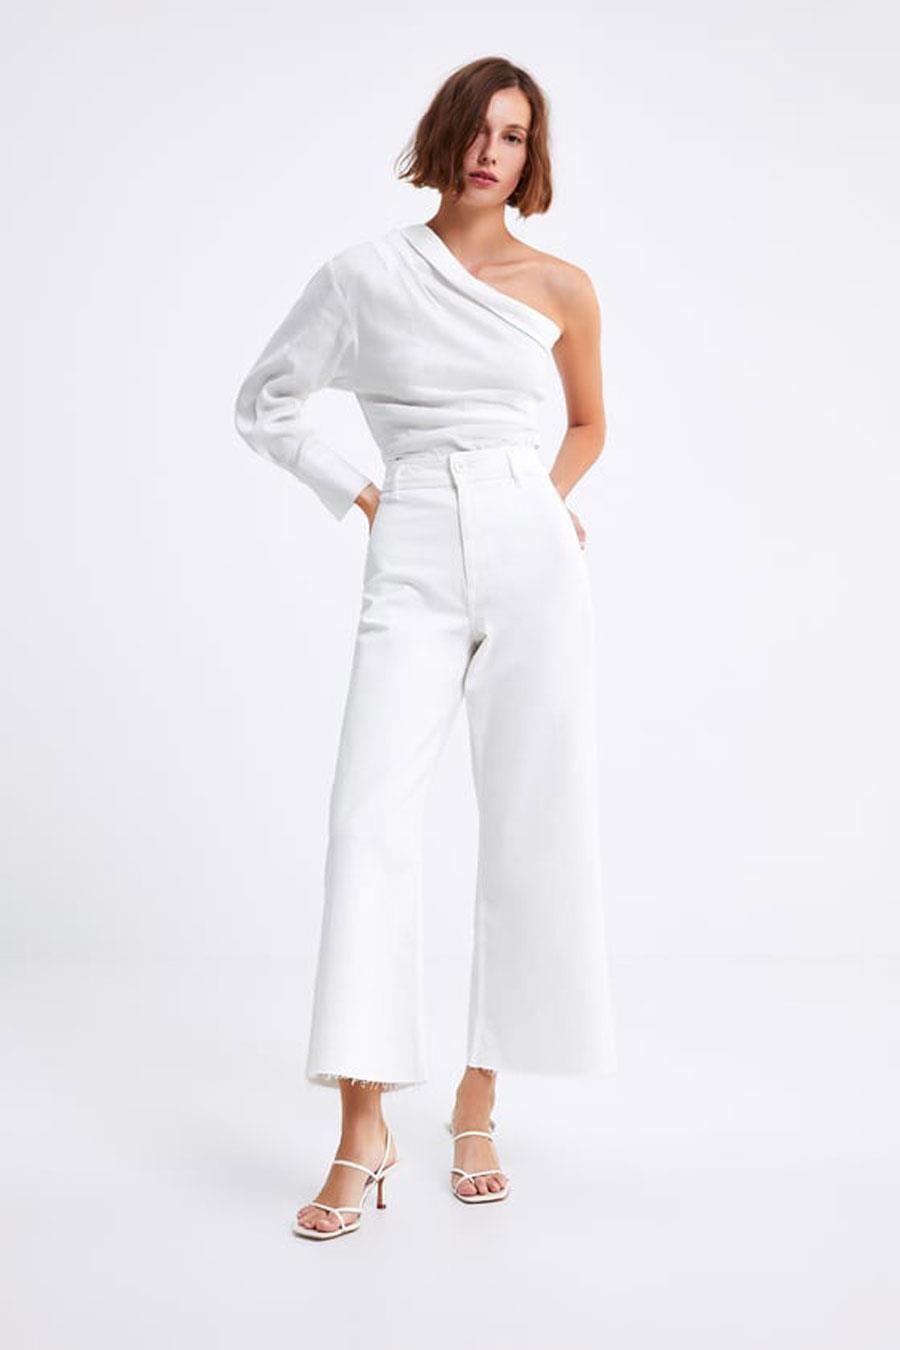 56e271e06 zara-pantalón-blanco-sara-carbonero. Pantalones vaqueros blancos